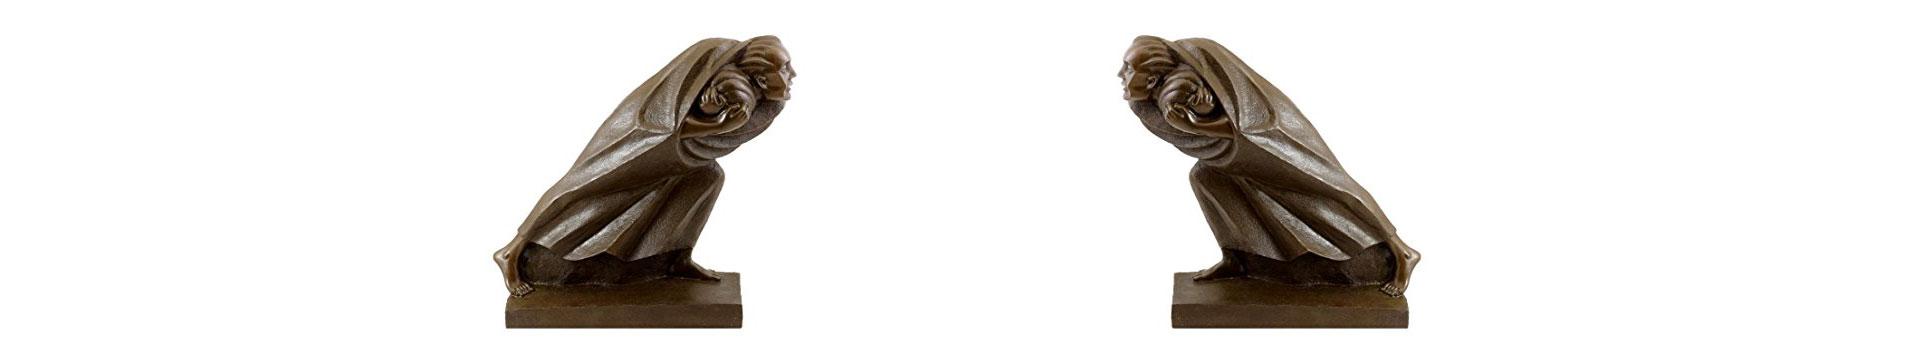 zwei Bronzefiguren